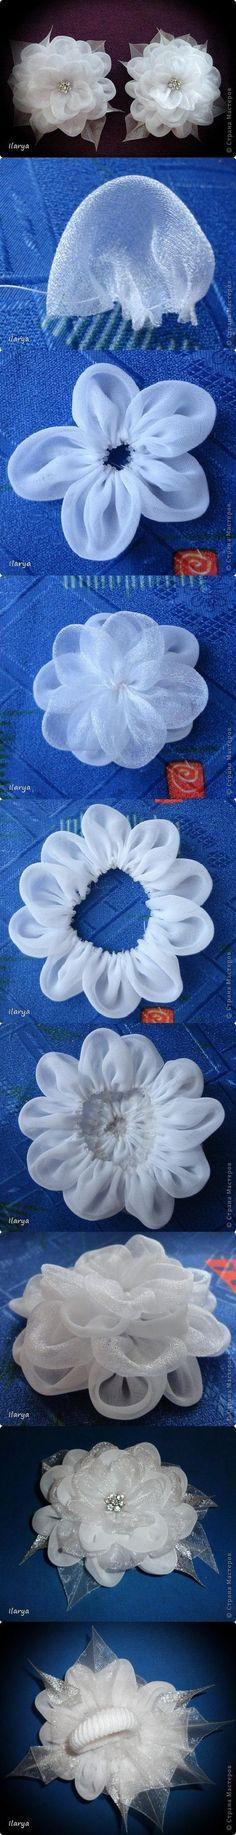 DIY Fabric Lust Flower DIY Projects                                                                                                                                                      Más